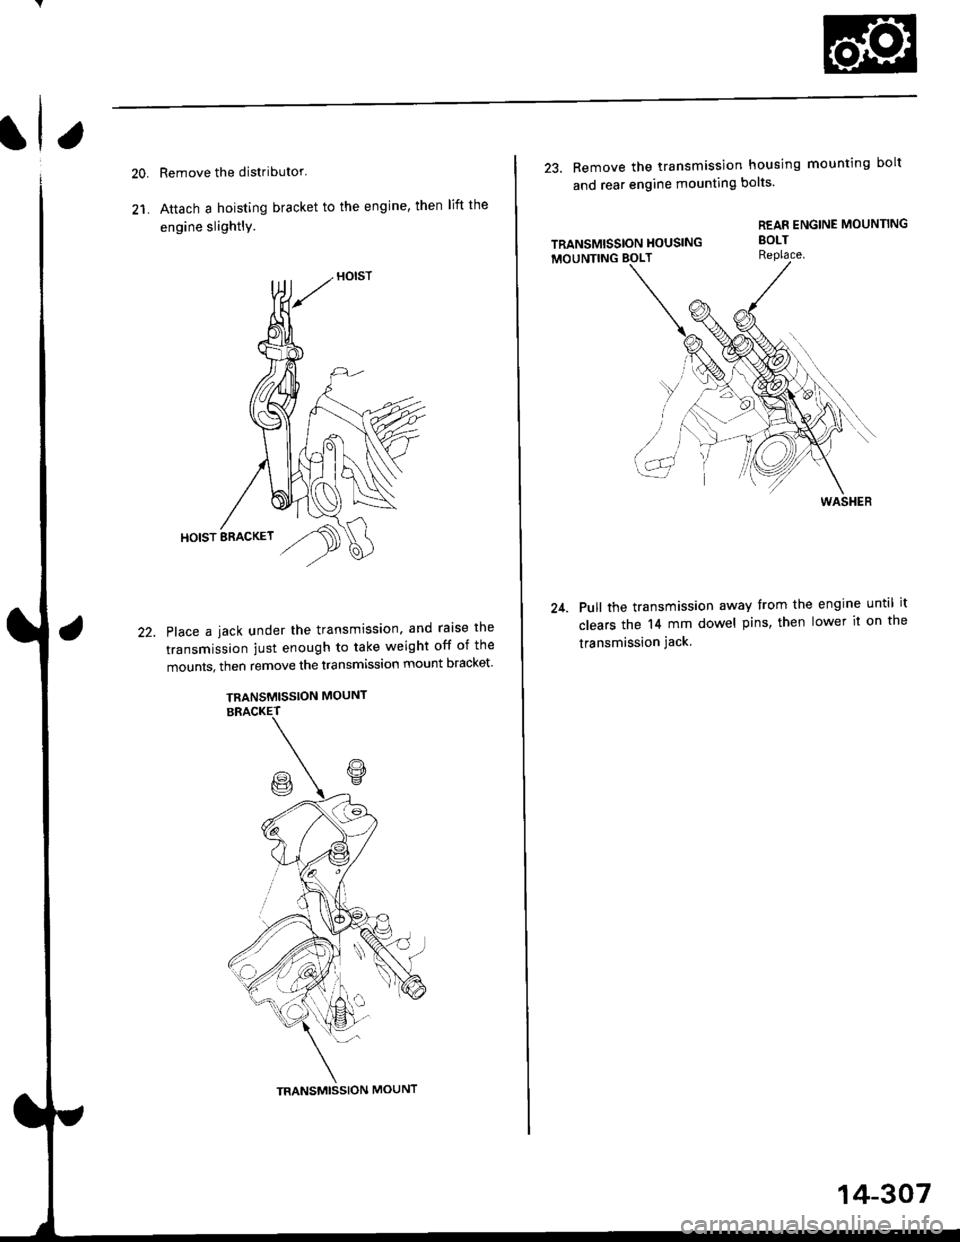 Honda Civic 1997 6g Workshop Manual Engine Mounts Diagram